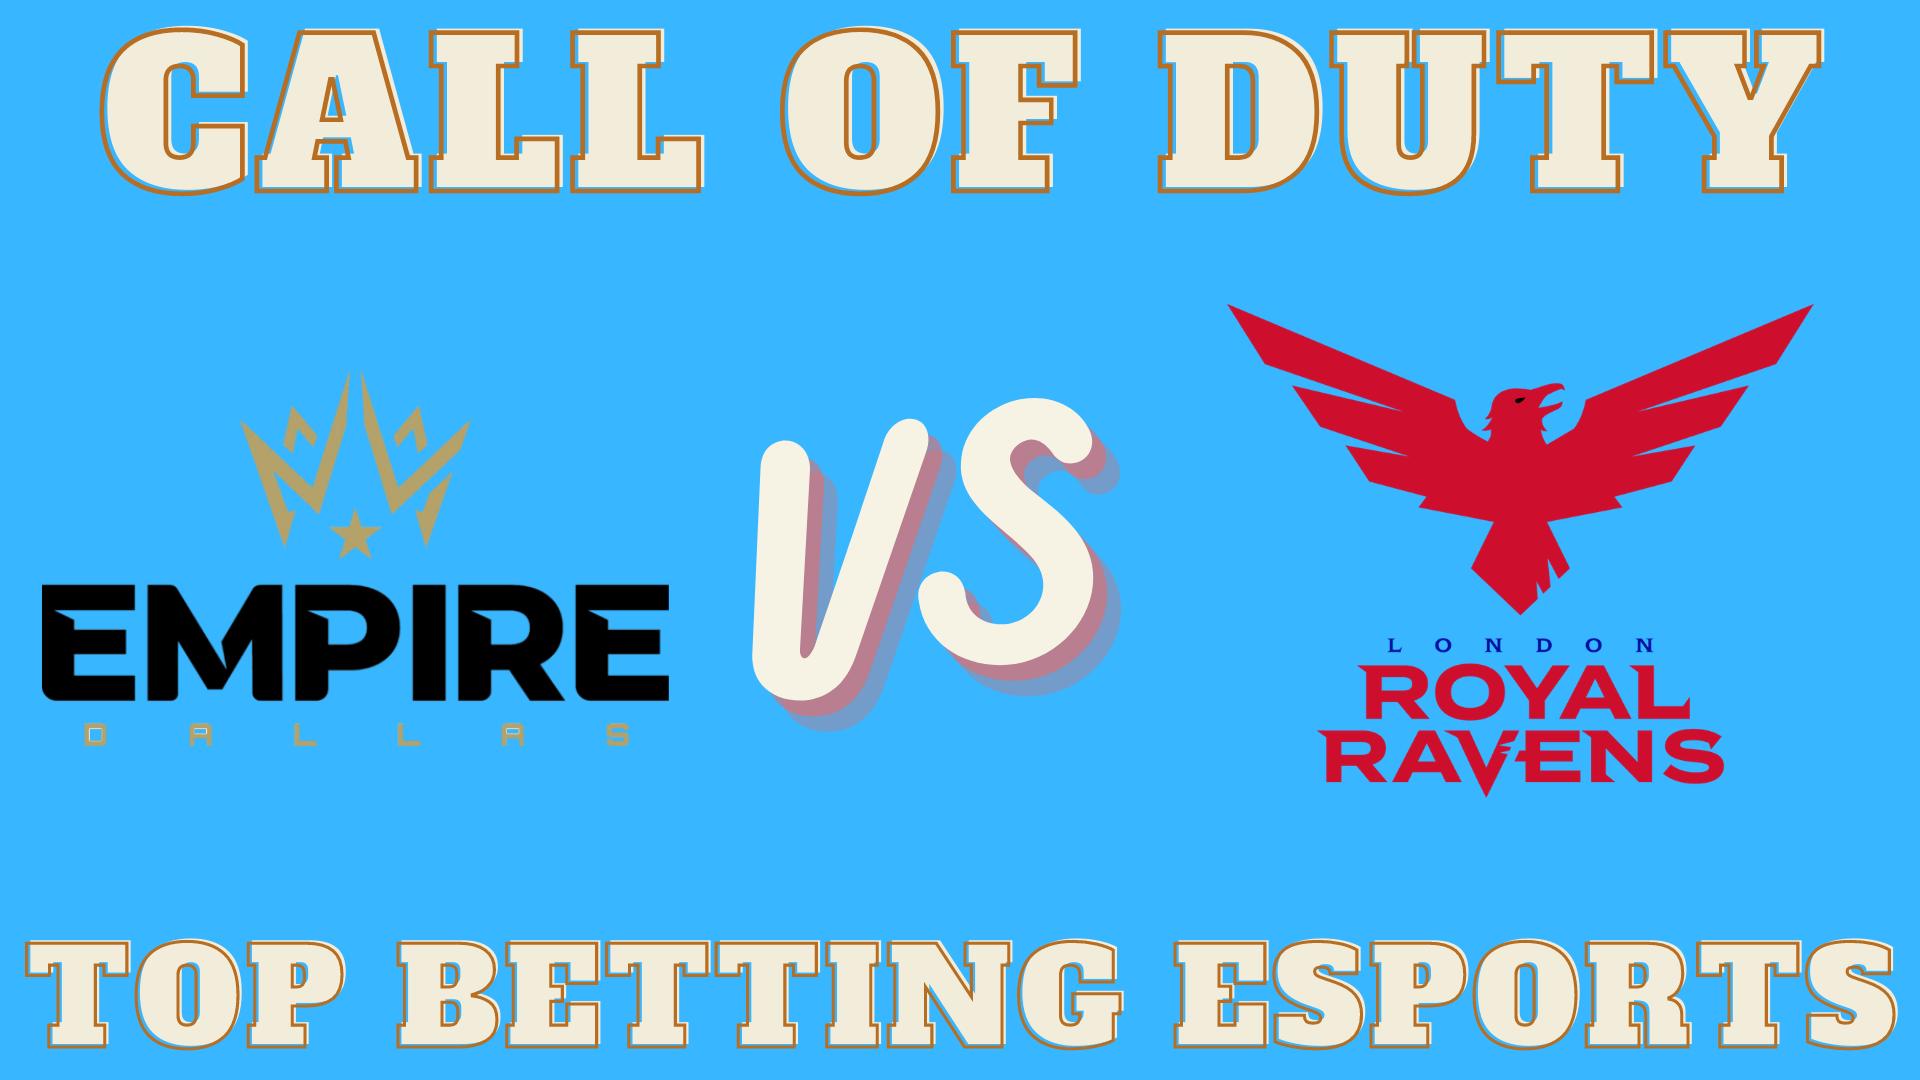 COD Dallas Empire vs London Royal Ravens Betting Prediction